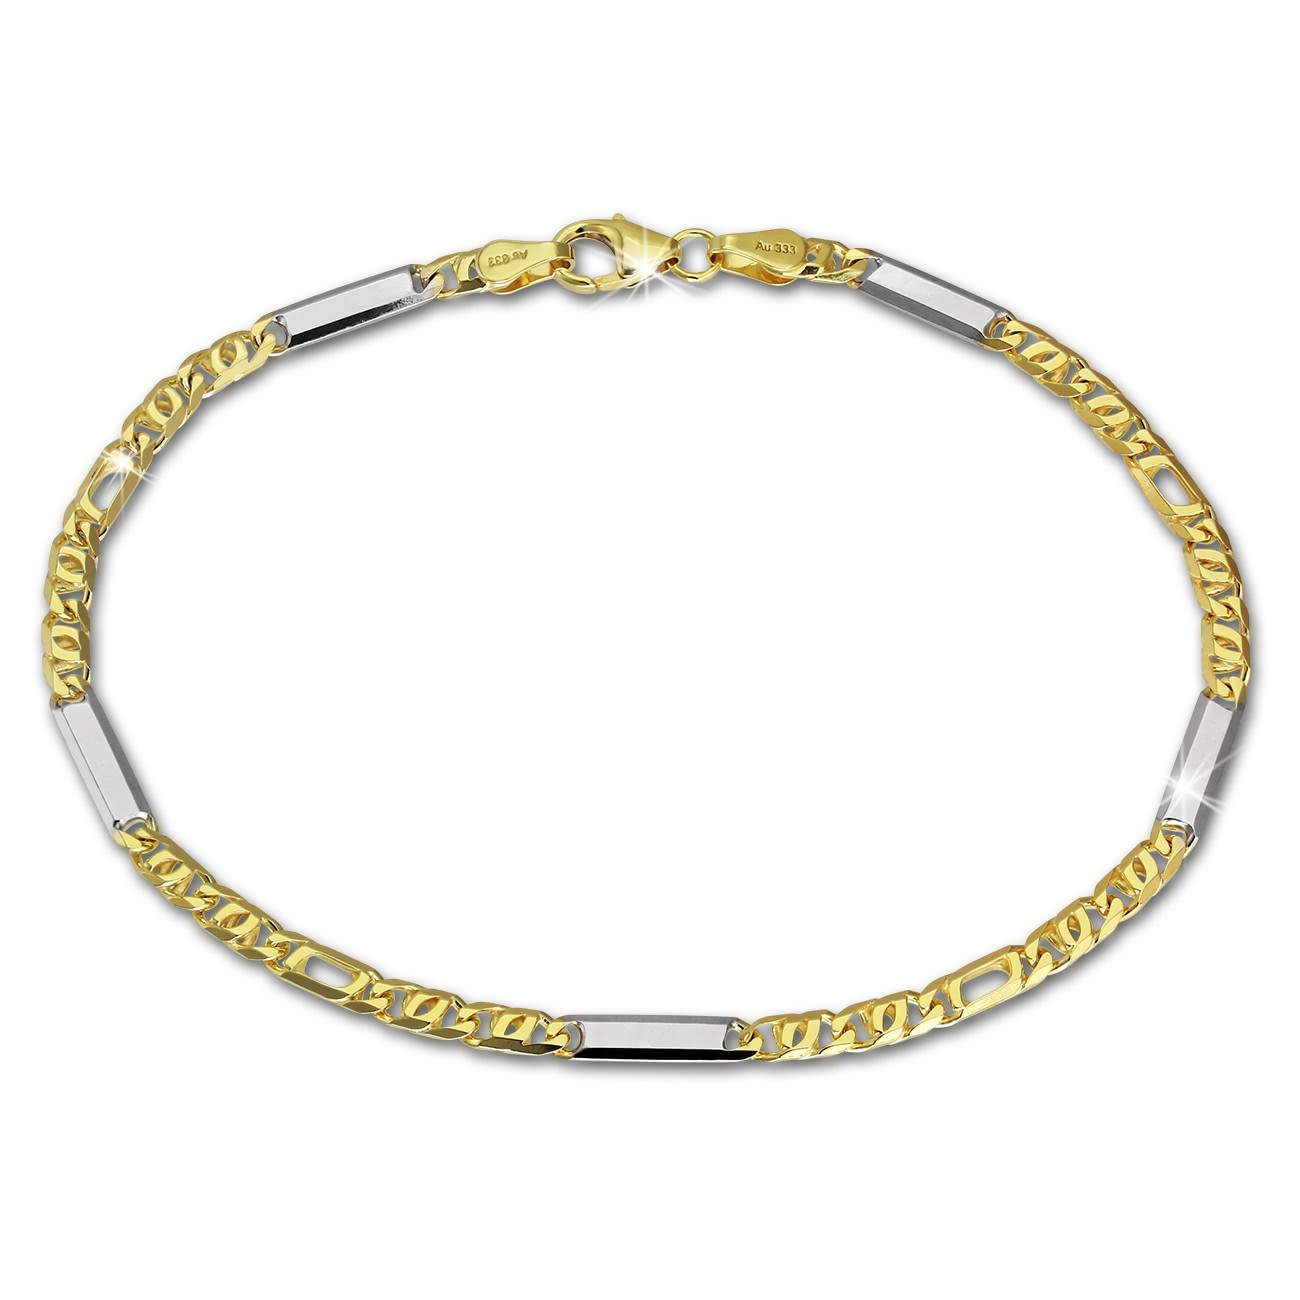 SilberDream Armband Tigerauge bicolor 333 Gold 19cm 8 Karat GDA0289T